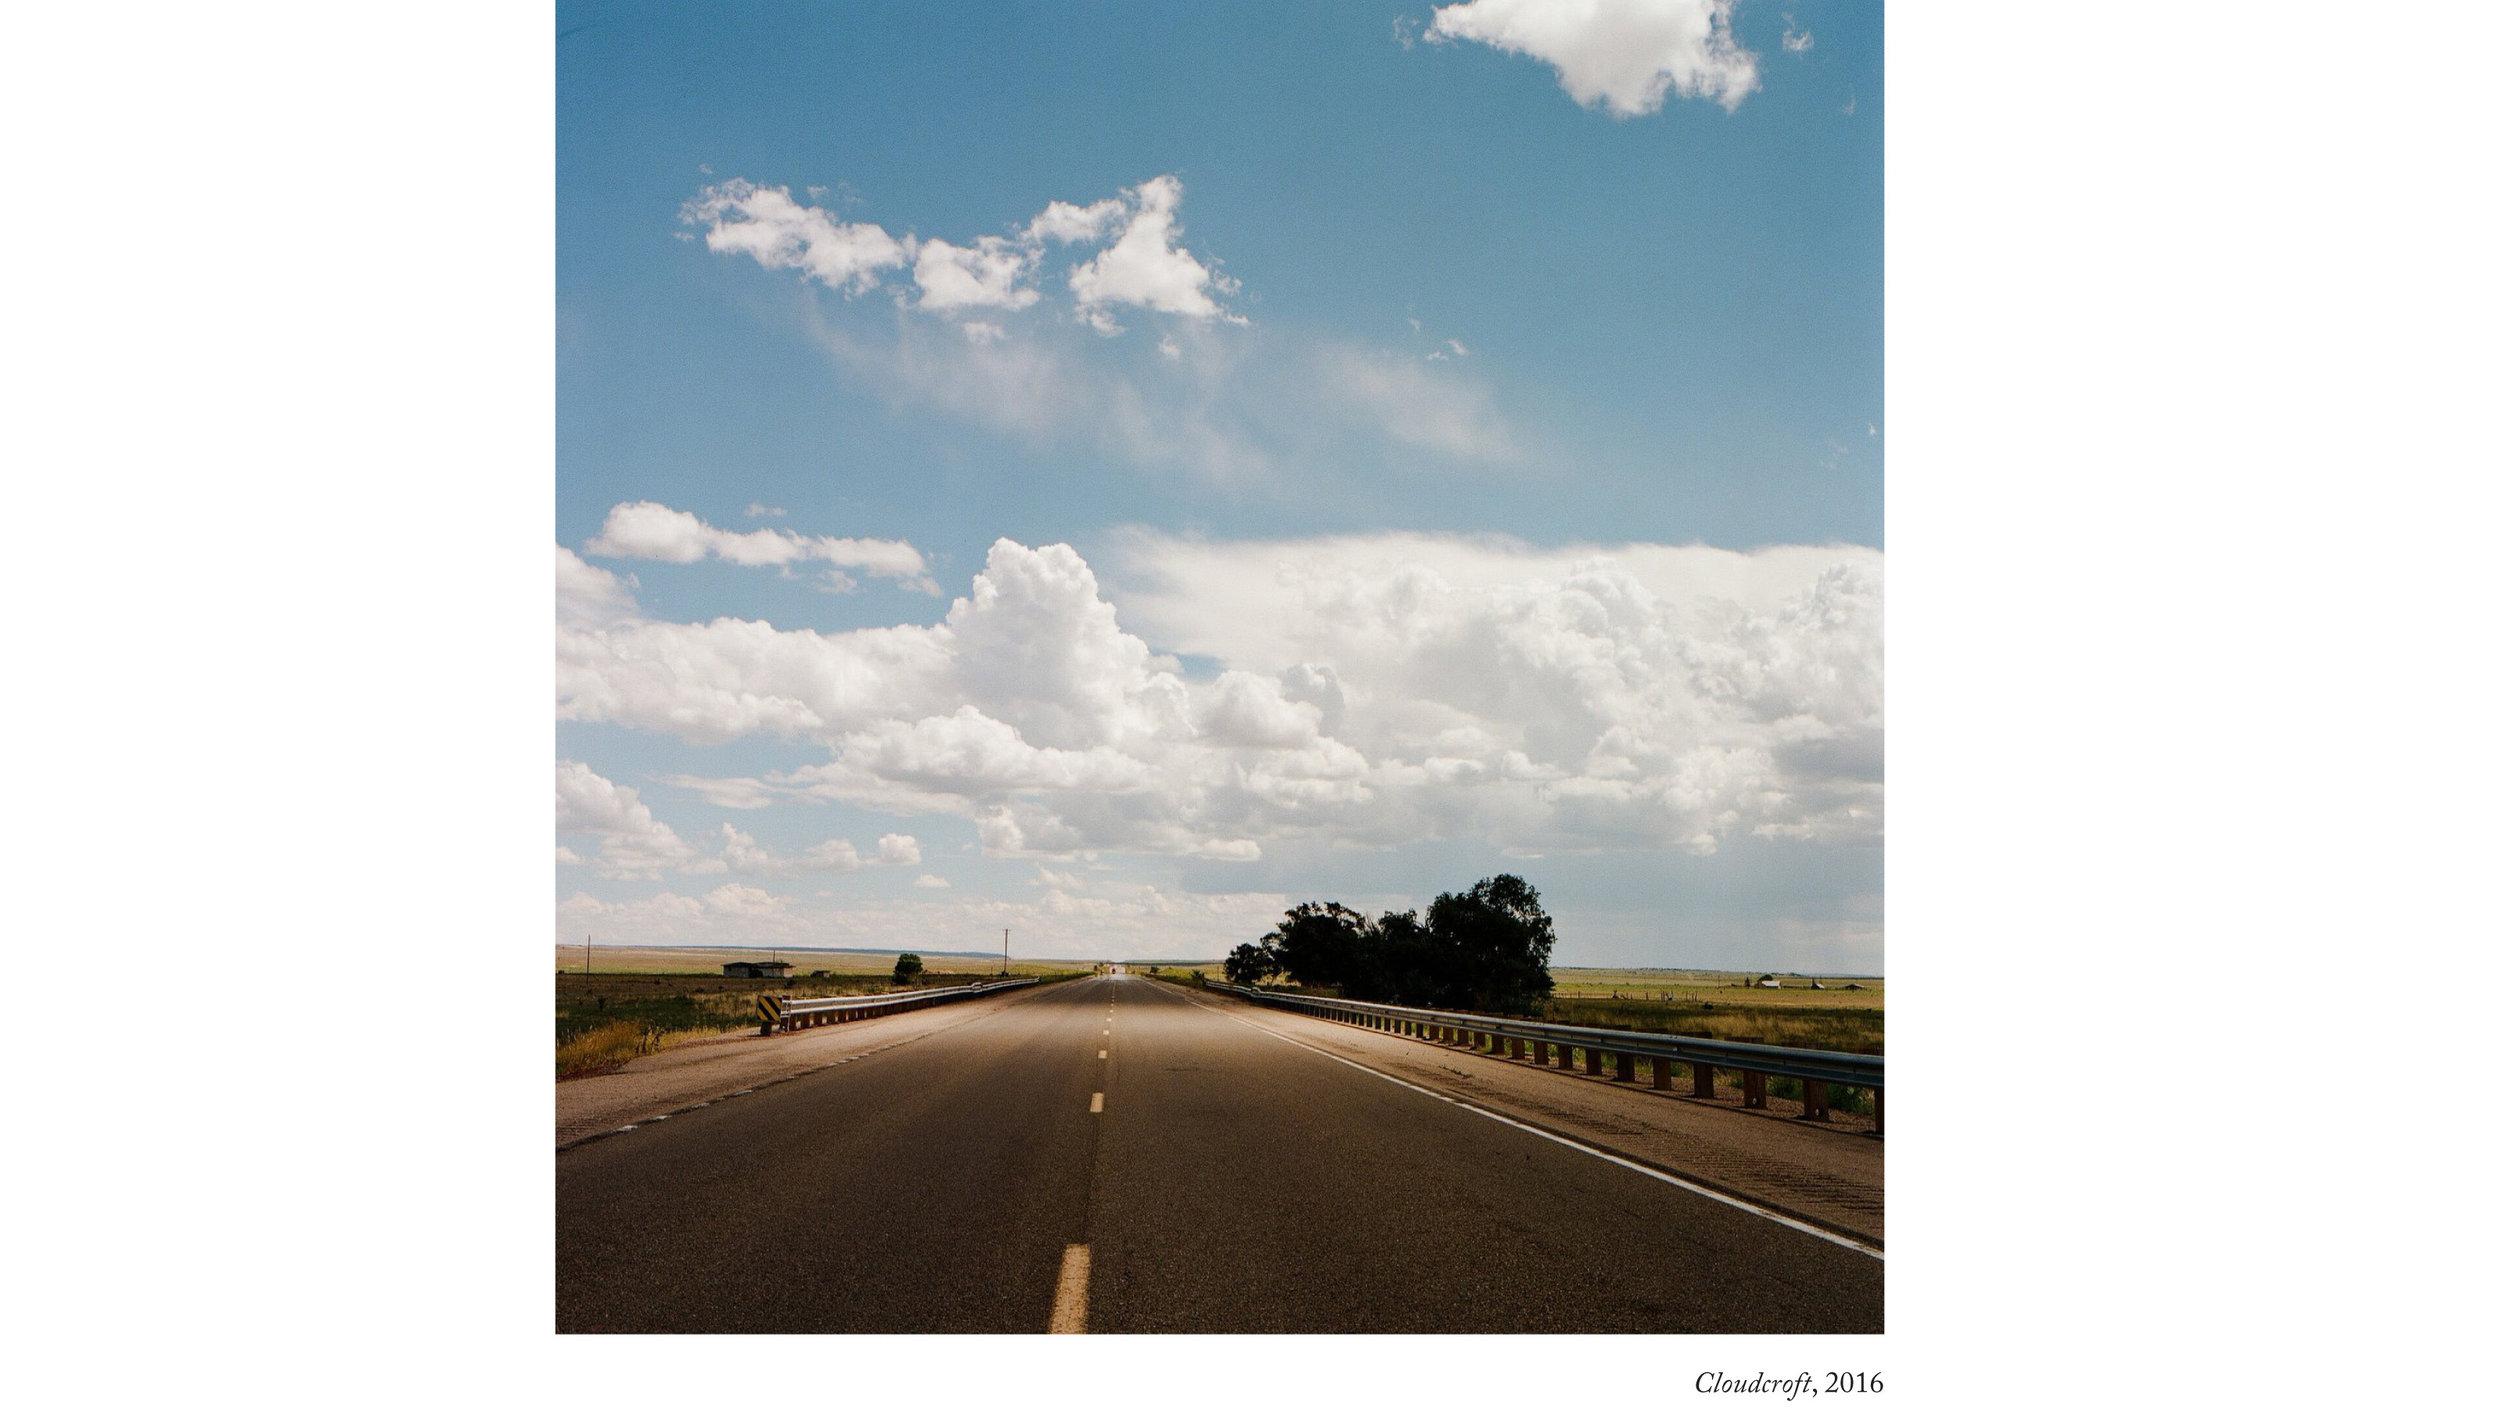 Cloudcroft.jpg